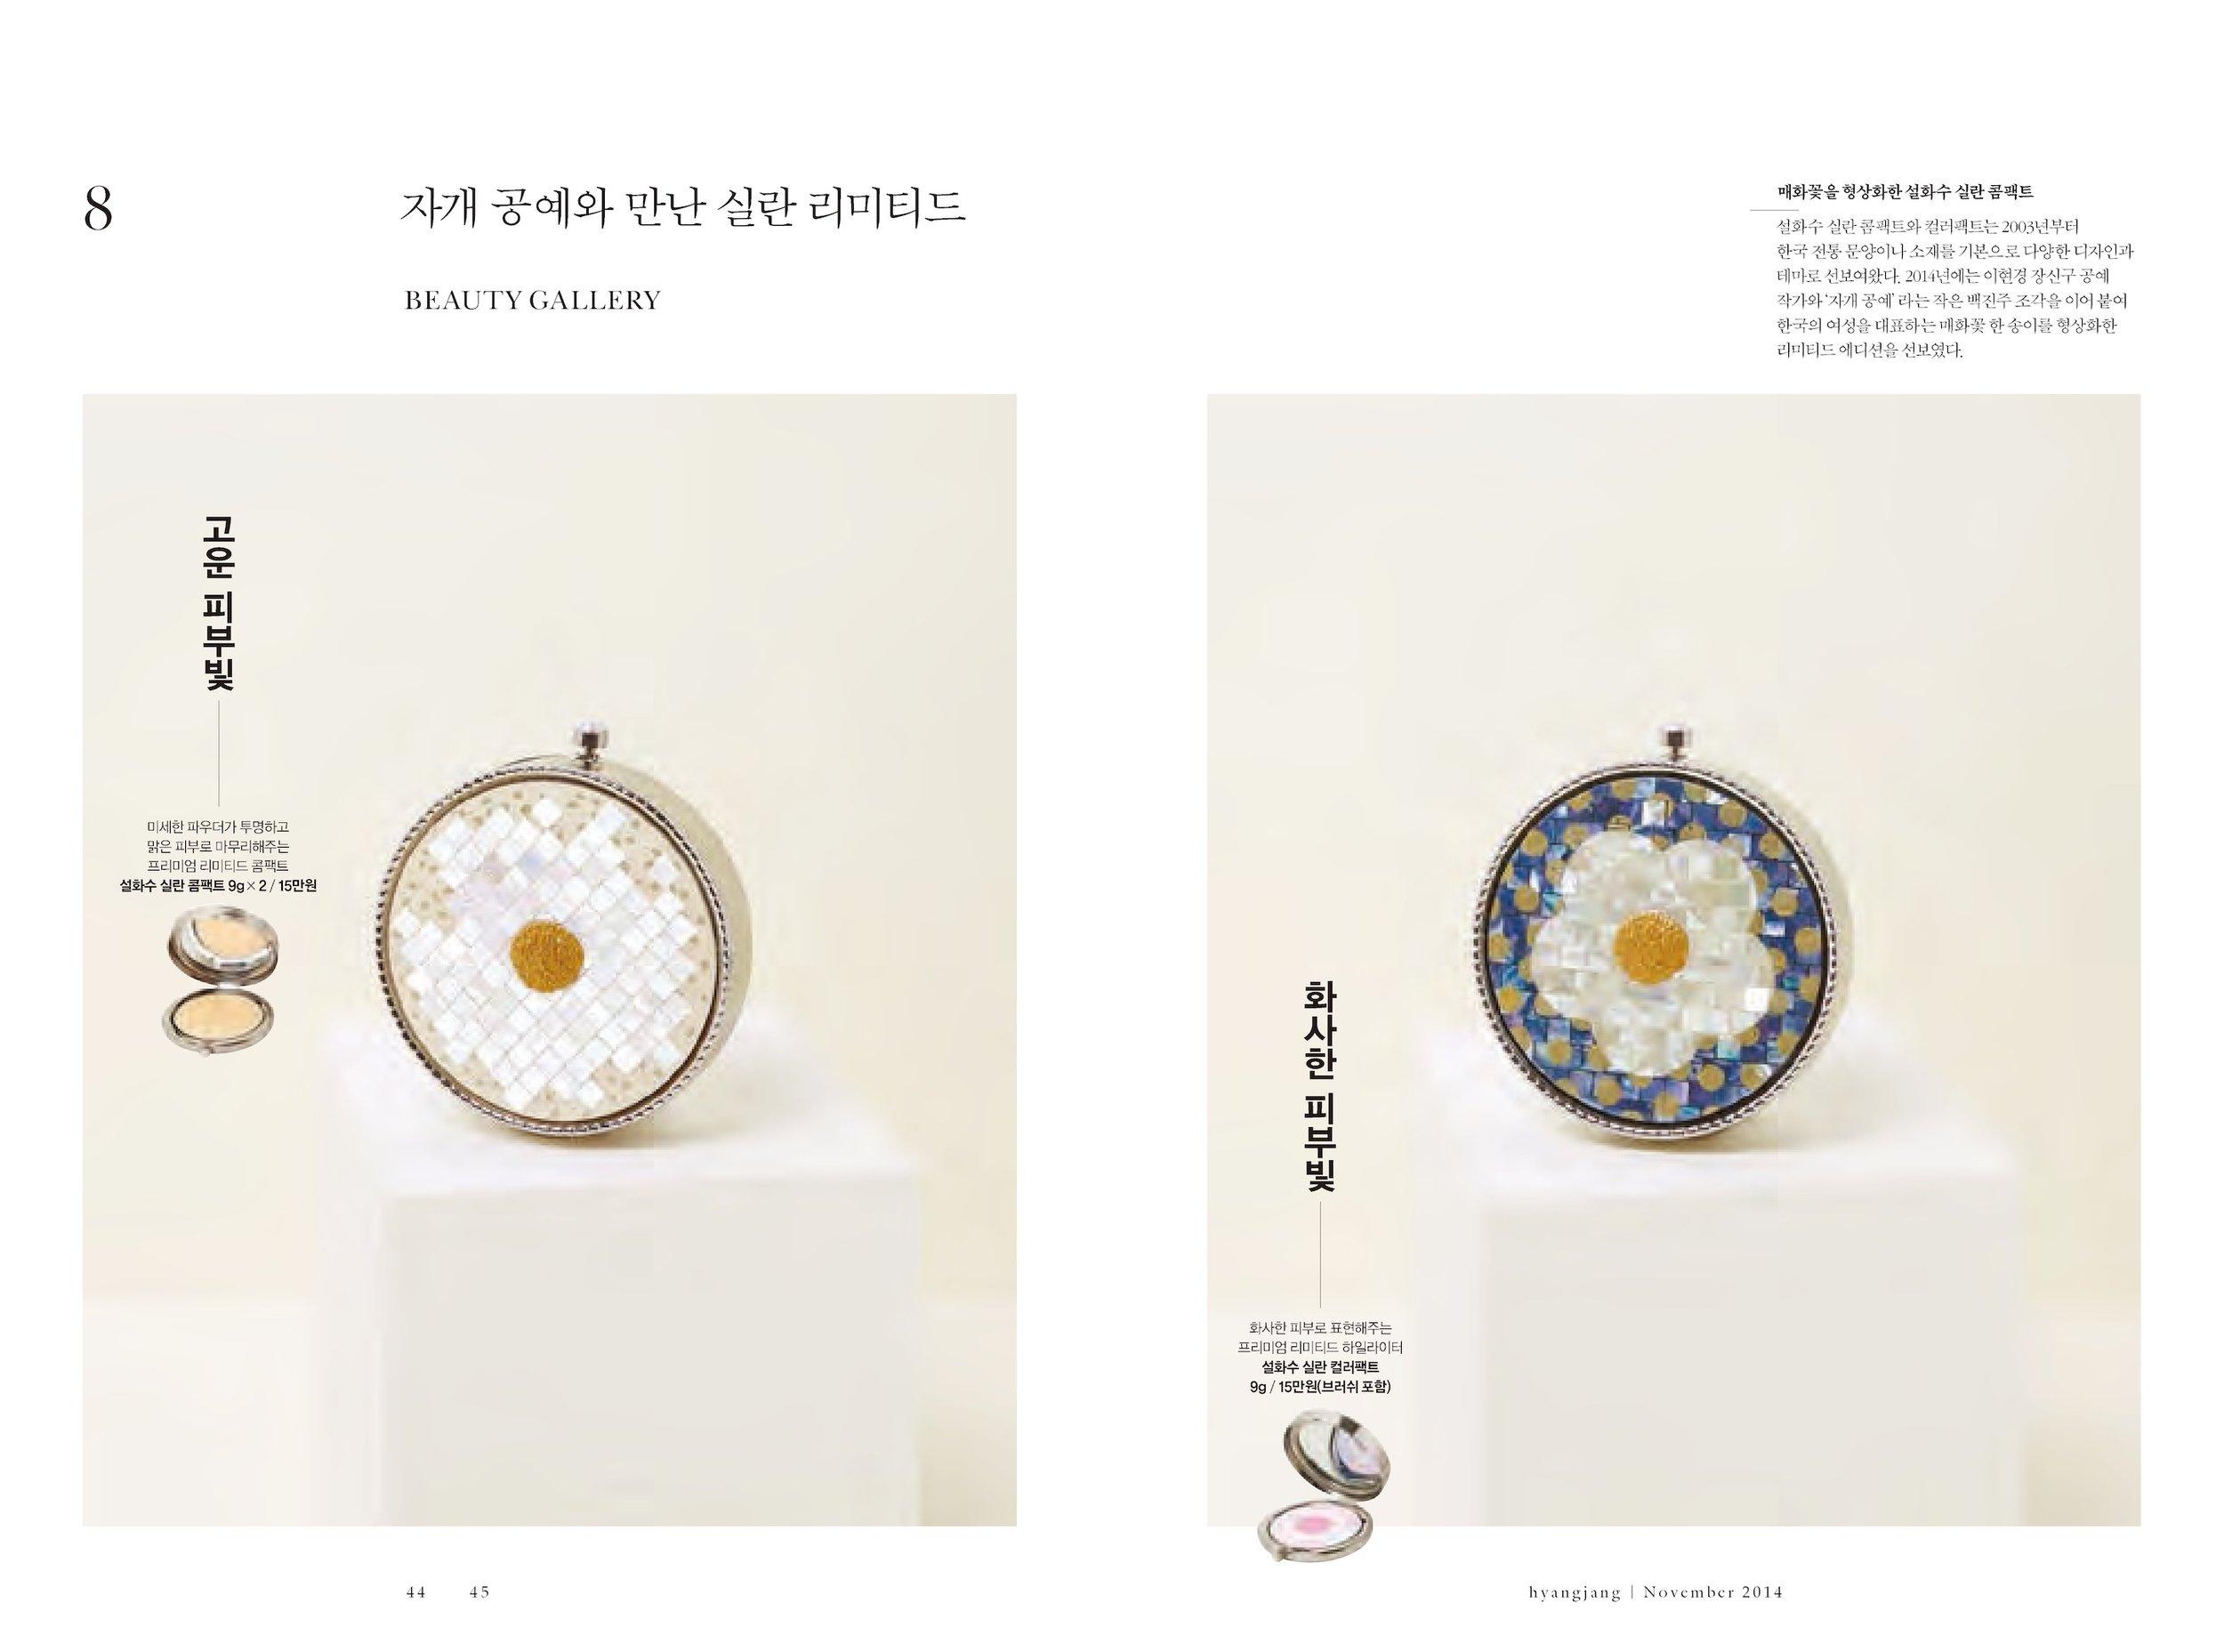 hyangjang-201411_페이지_23.jpeg